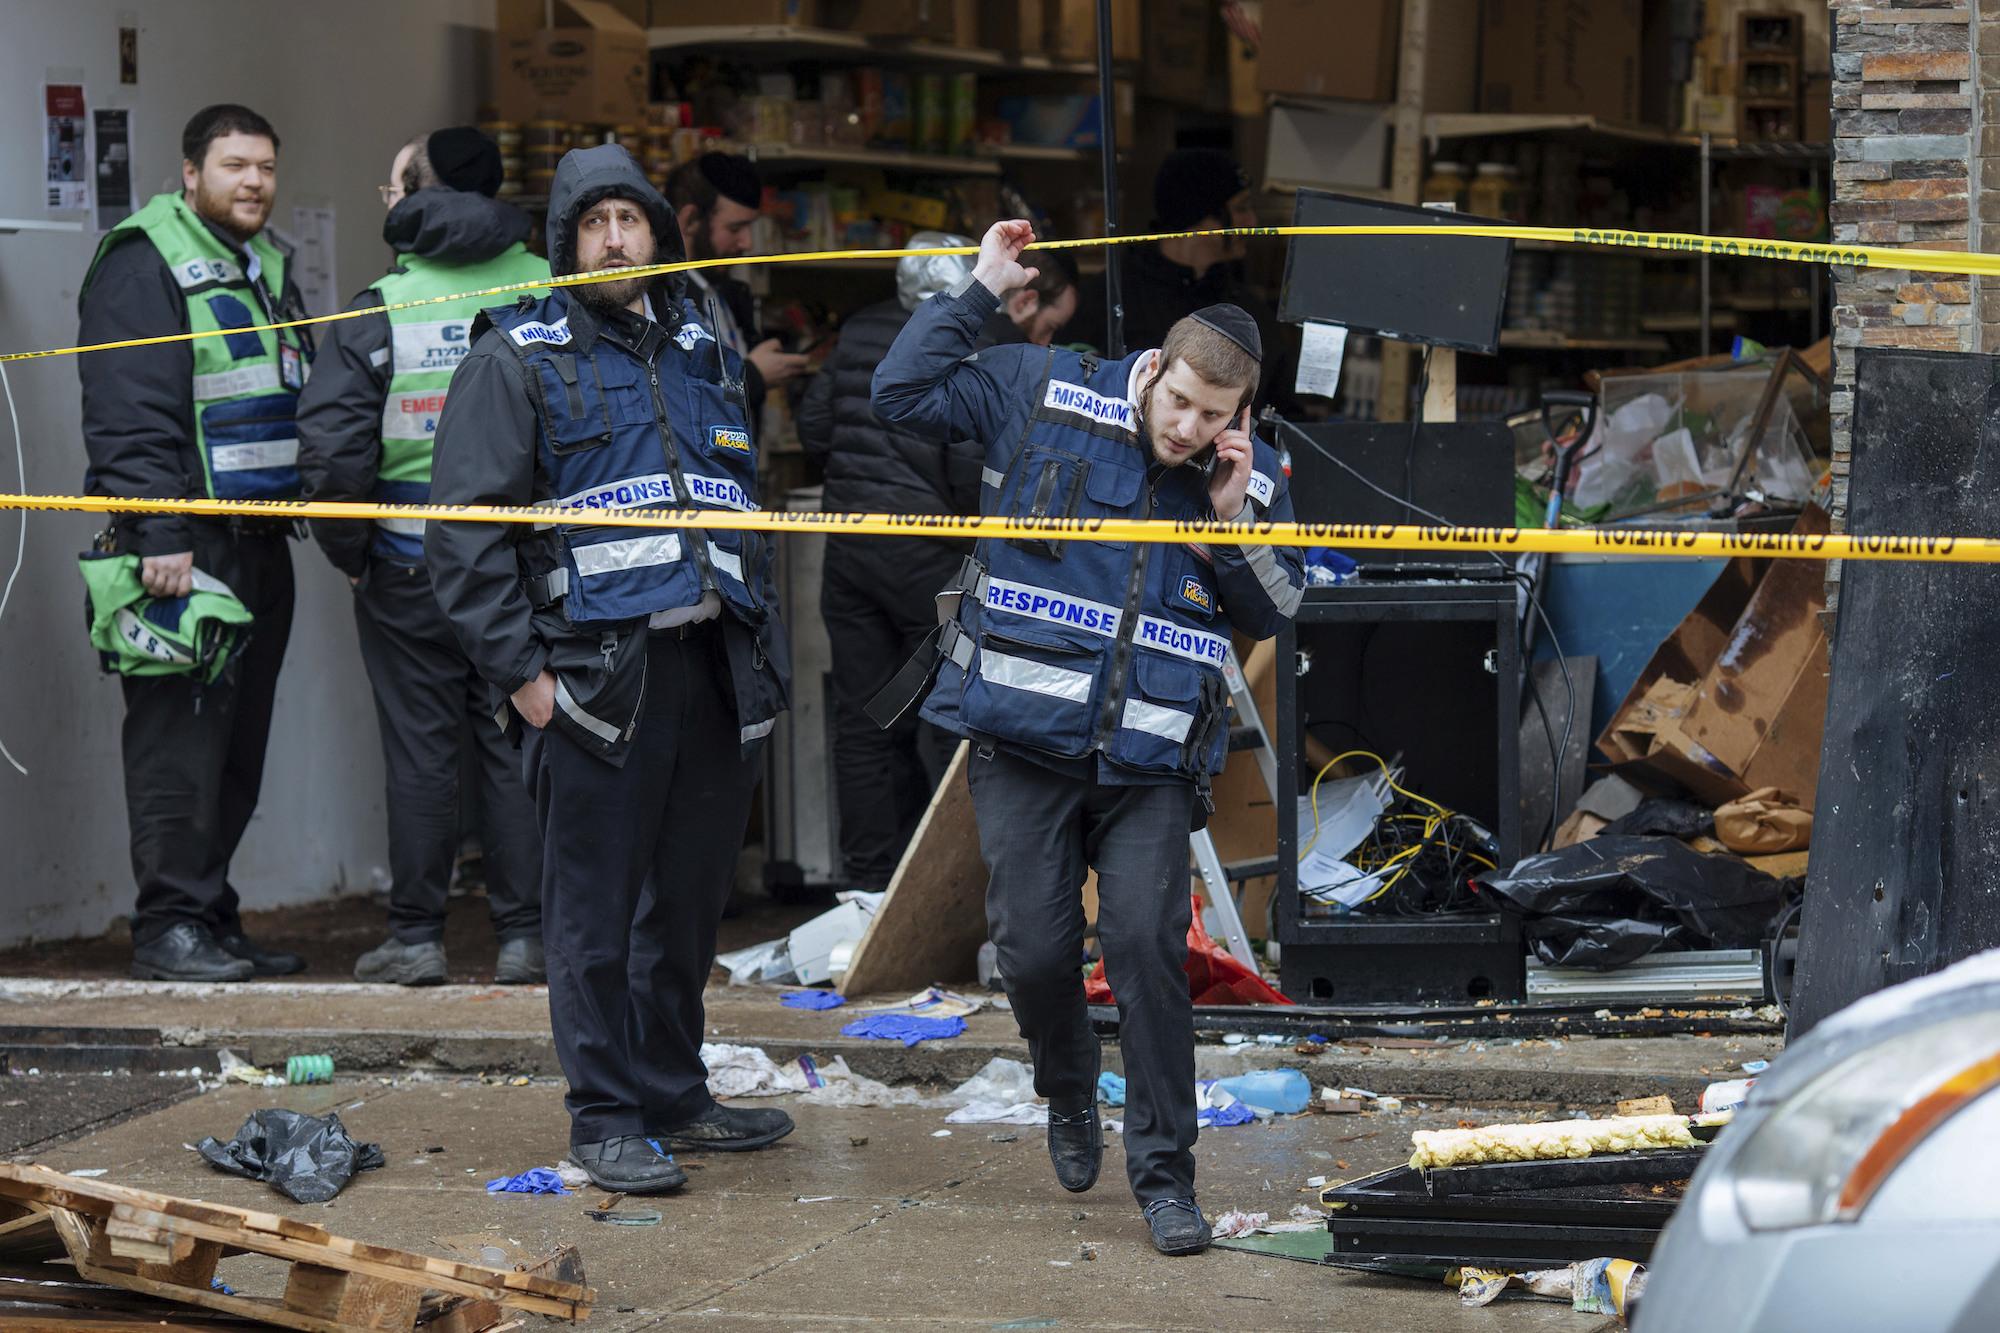 Jersey City's mayor says gunmen targeted kosher market